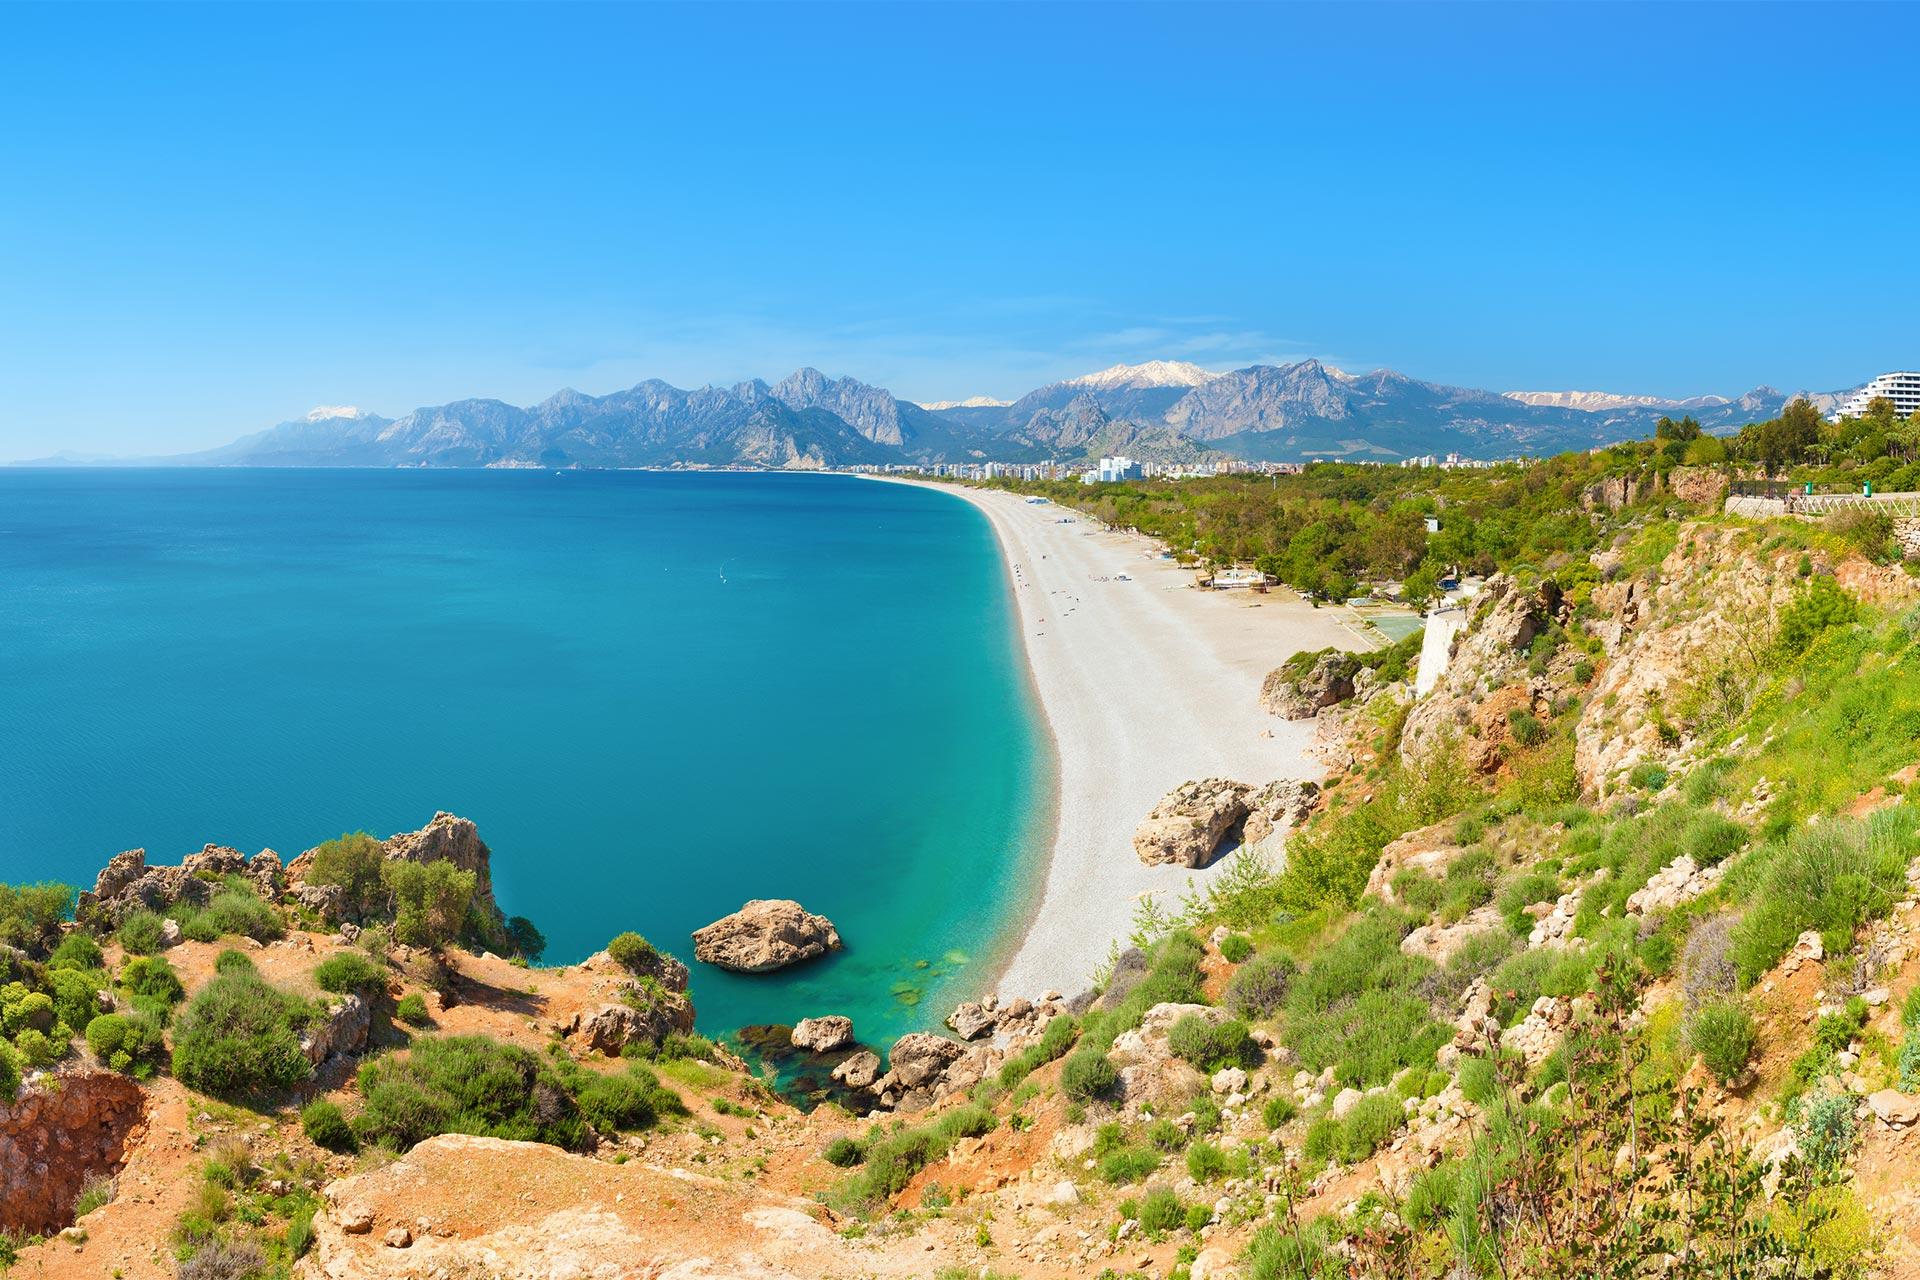 Sejur Charter plaja Antalya, 8 zile